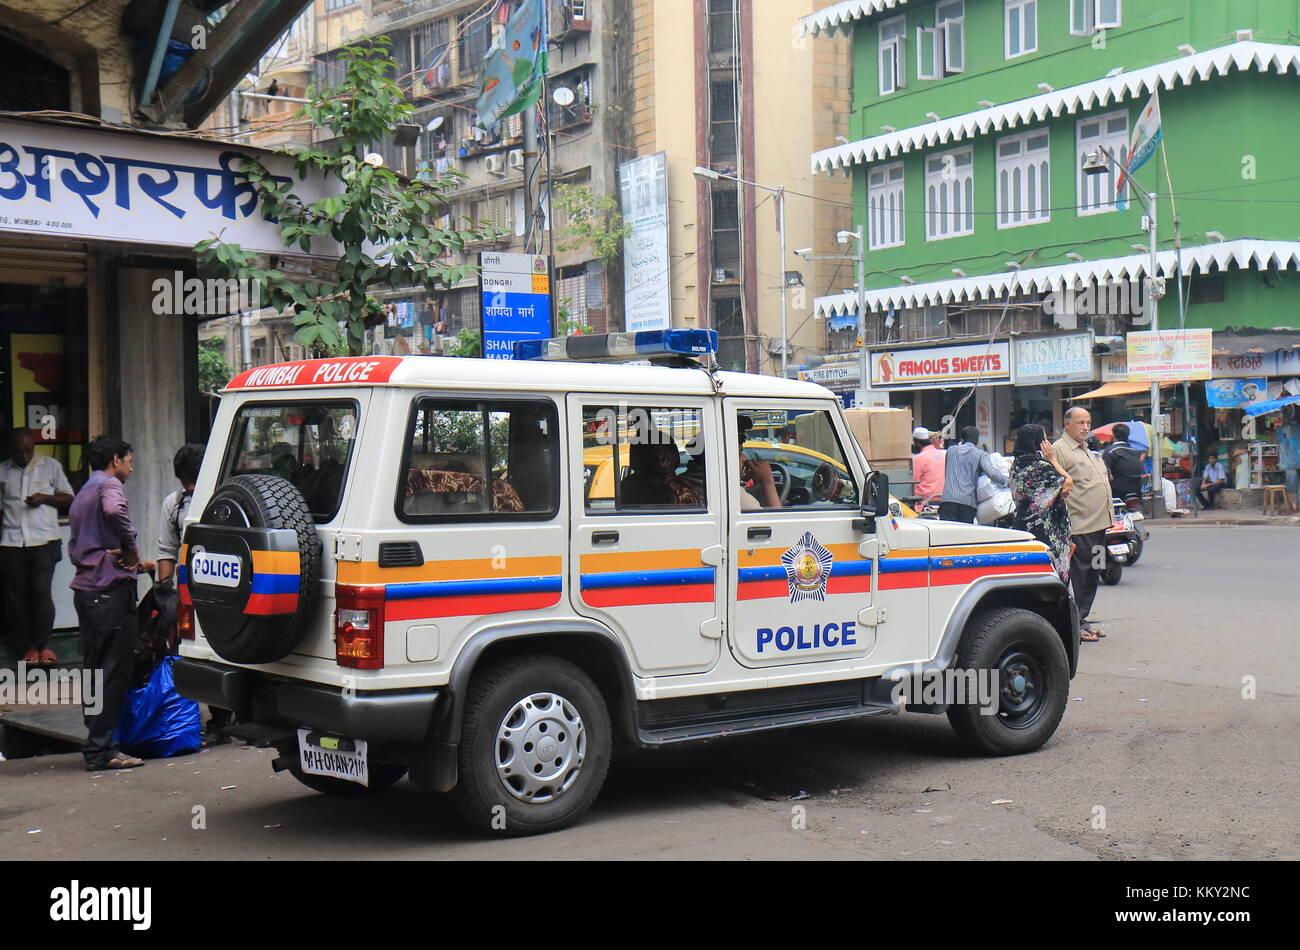 Dubai Police Car Wallpapers Police Car India Stock Photos Amp Police Car India Stock